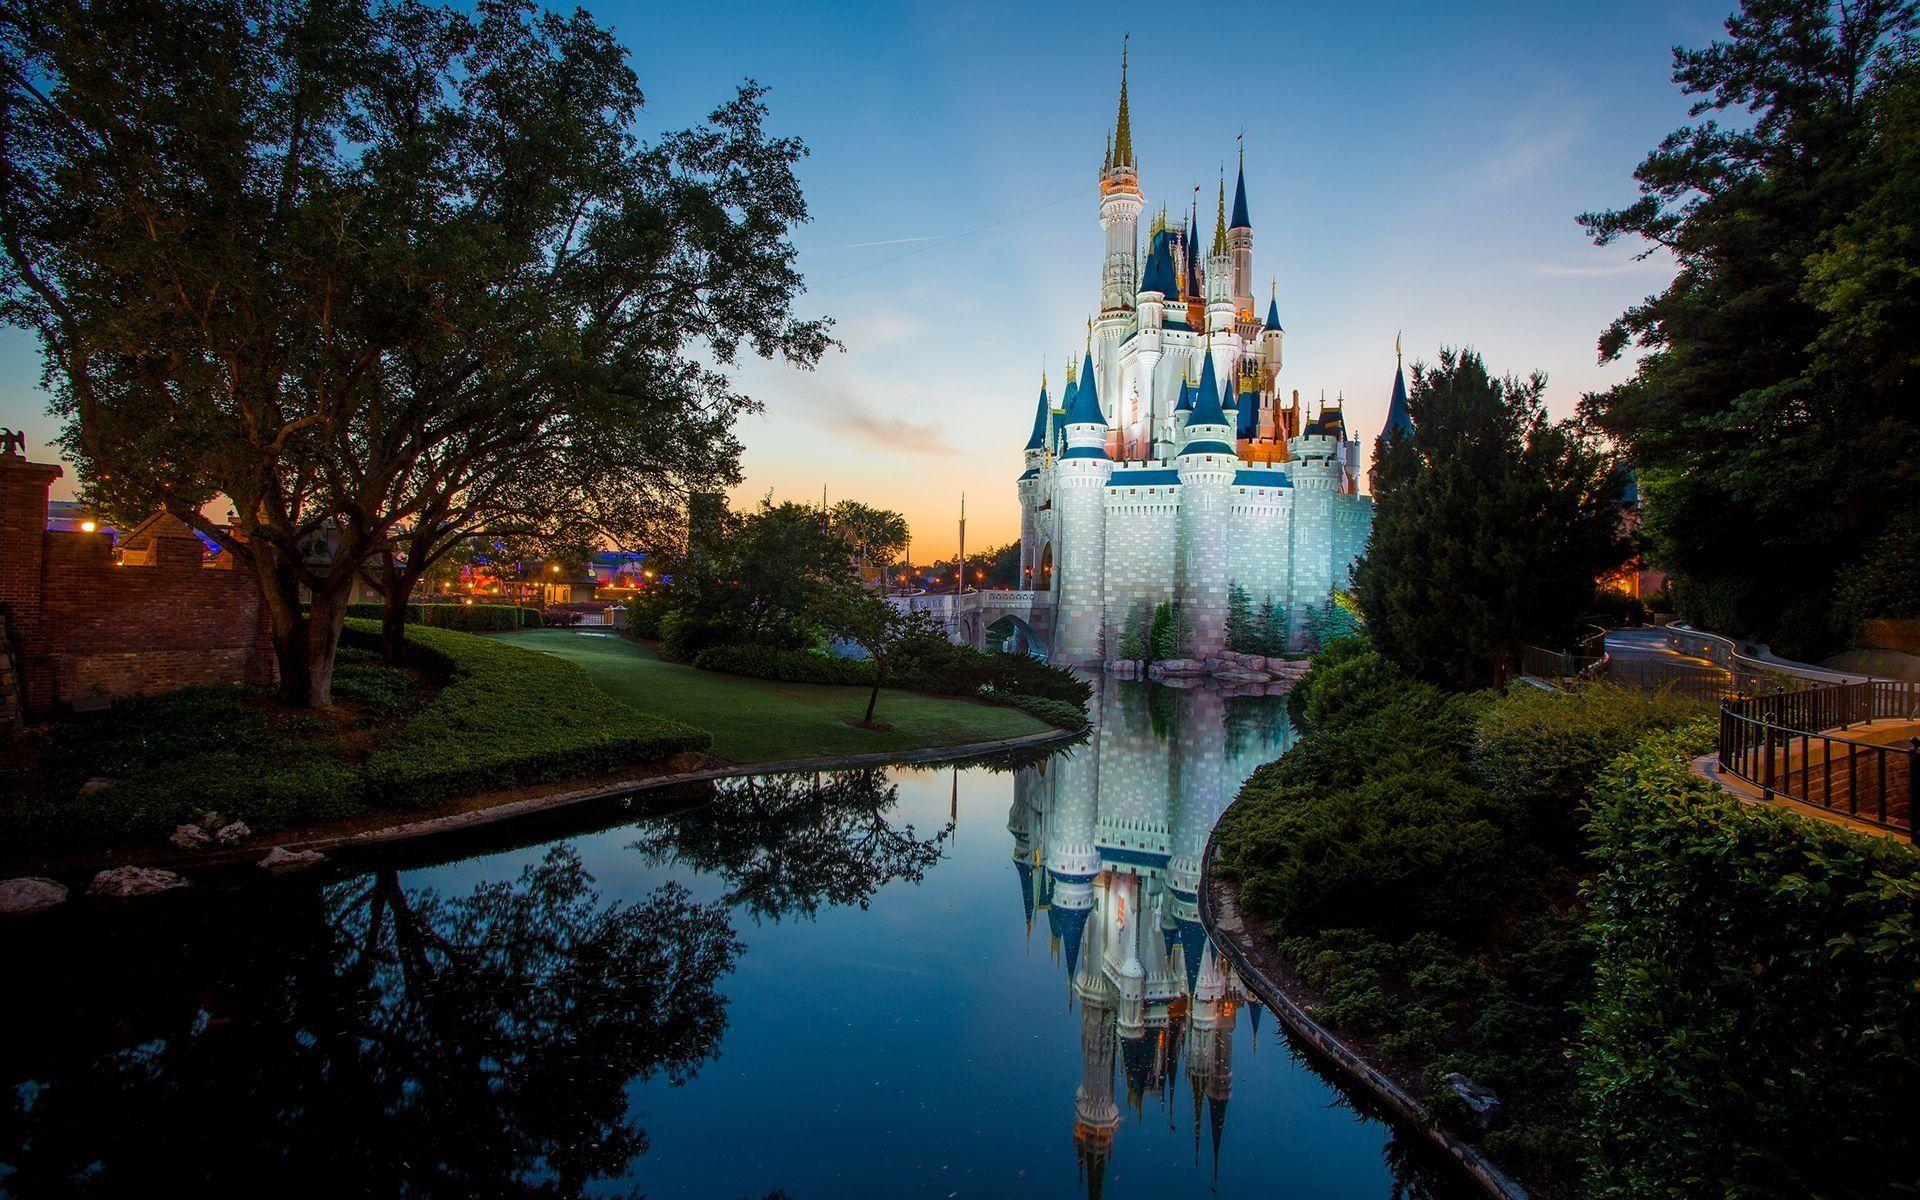 Disney Castle Wallpaper Picture Disneyland Castle Disney Photography Disney Castle